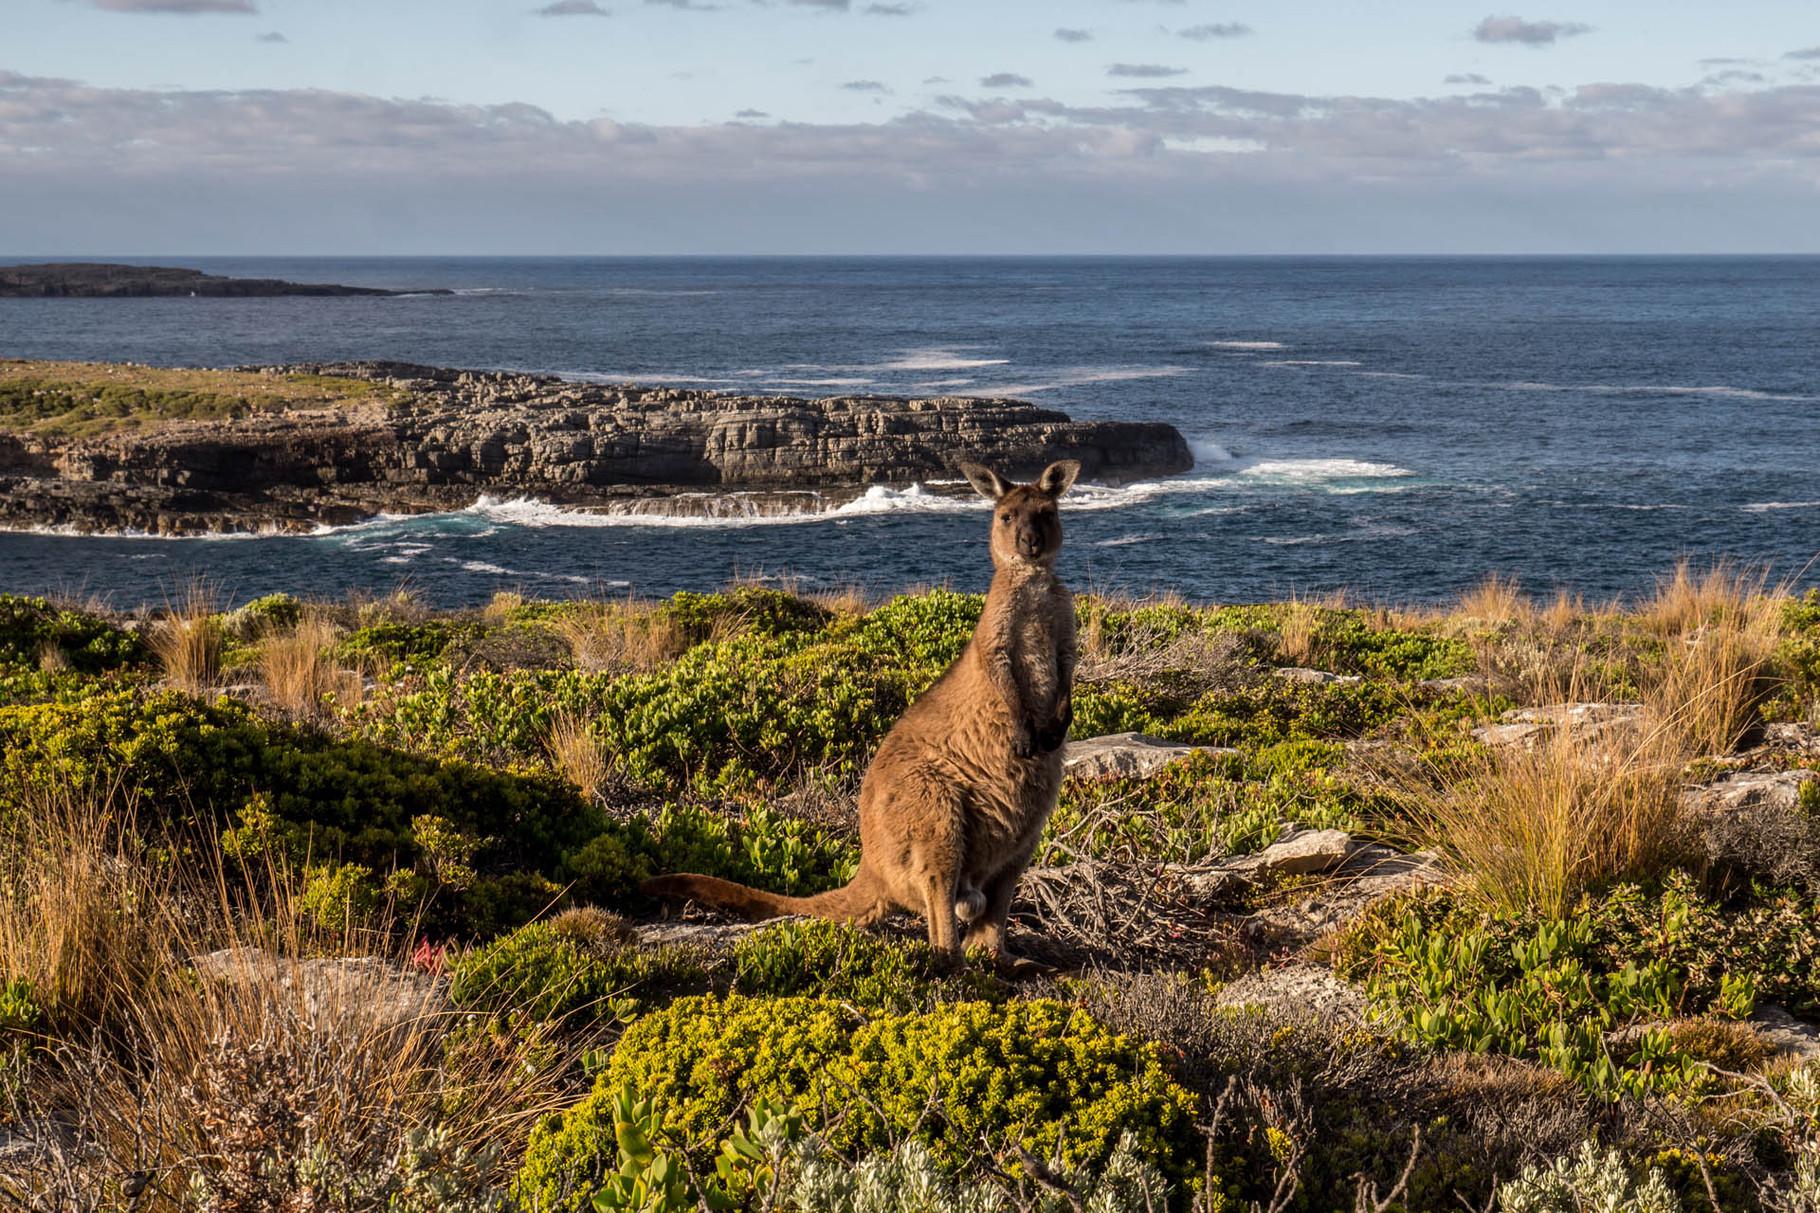 Kangaroos [Kangaroo Island, Australia, 2014]